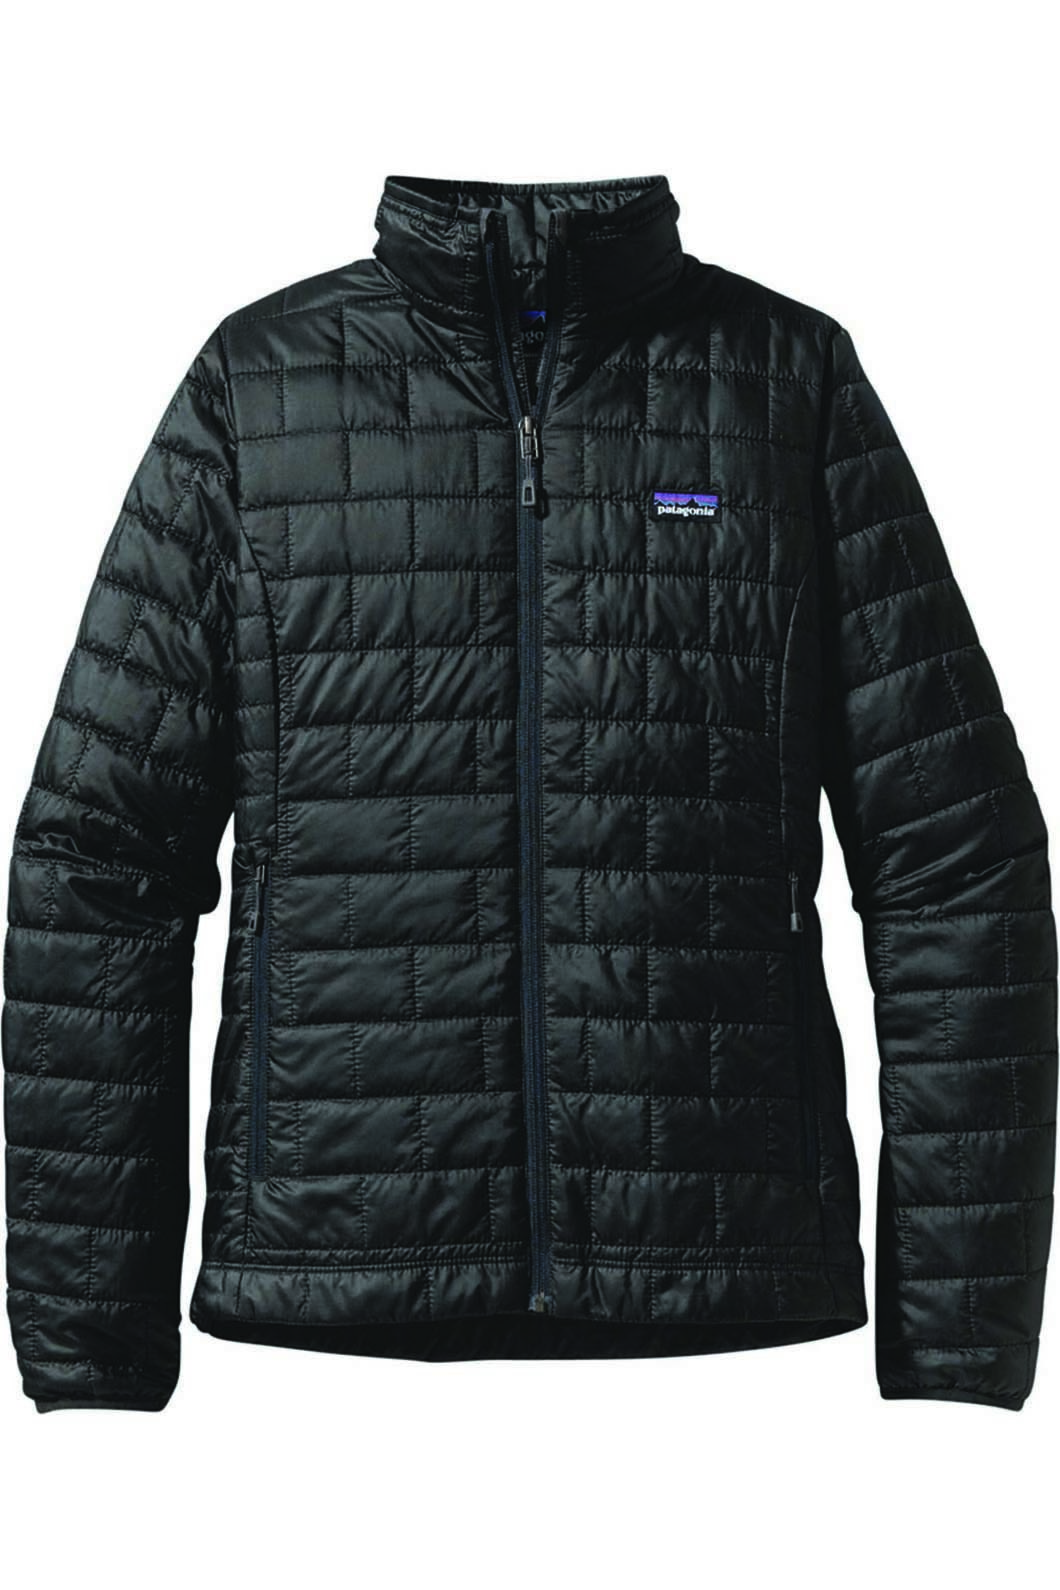 Patagonia W's Nano Puff Jacket, Black, hi-res